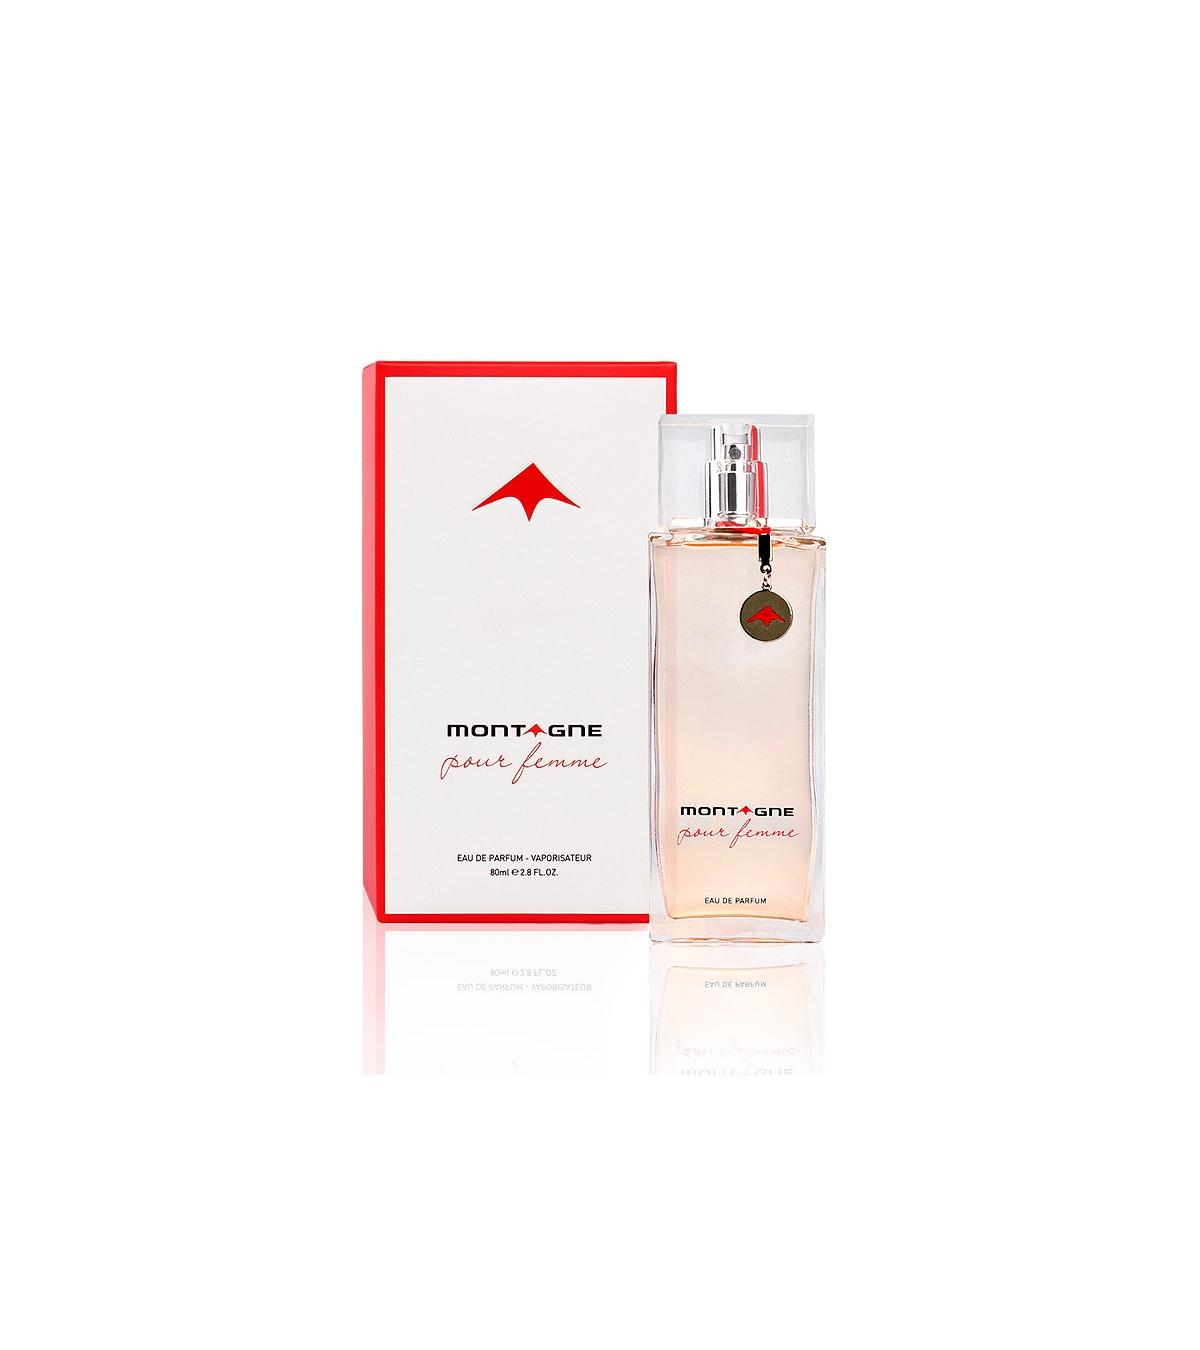 Perfume de mujer Montagne 55 ml